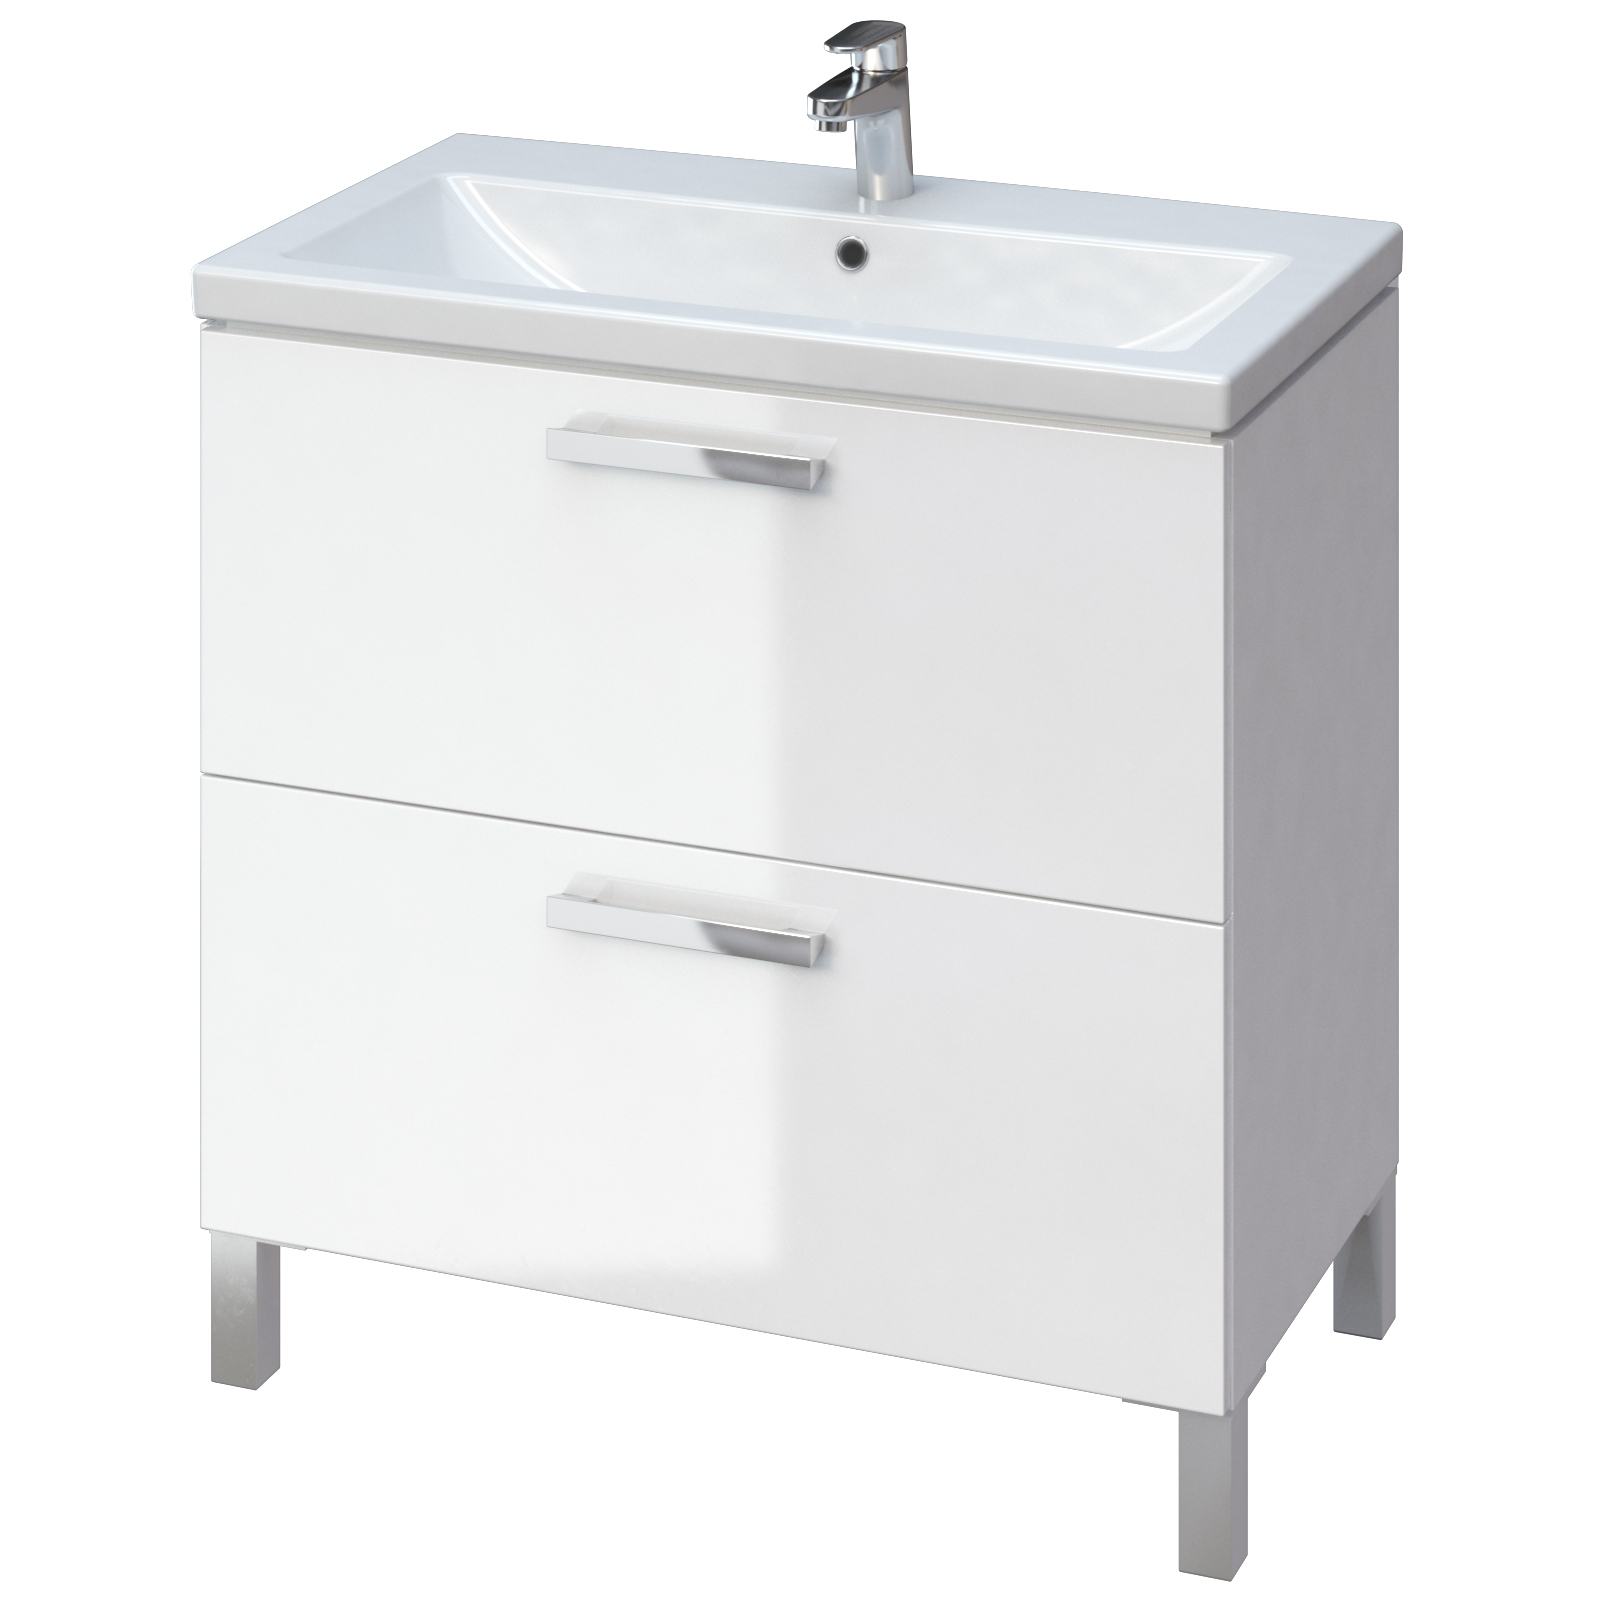 Шкафчик CERSANIT MELAR + раковина COMO 80, белый